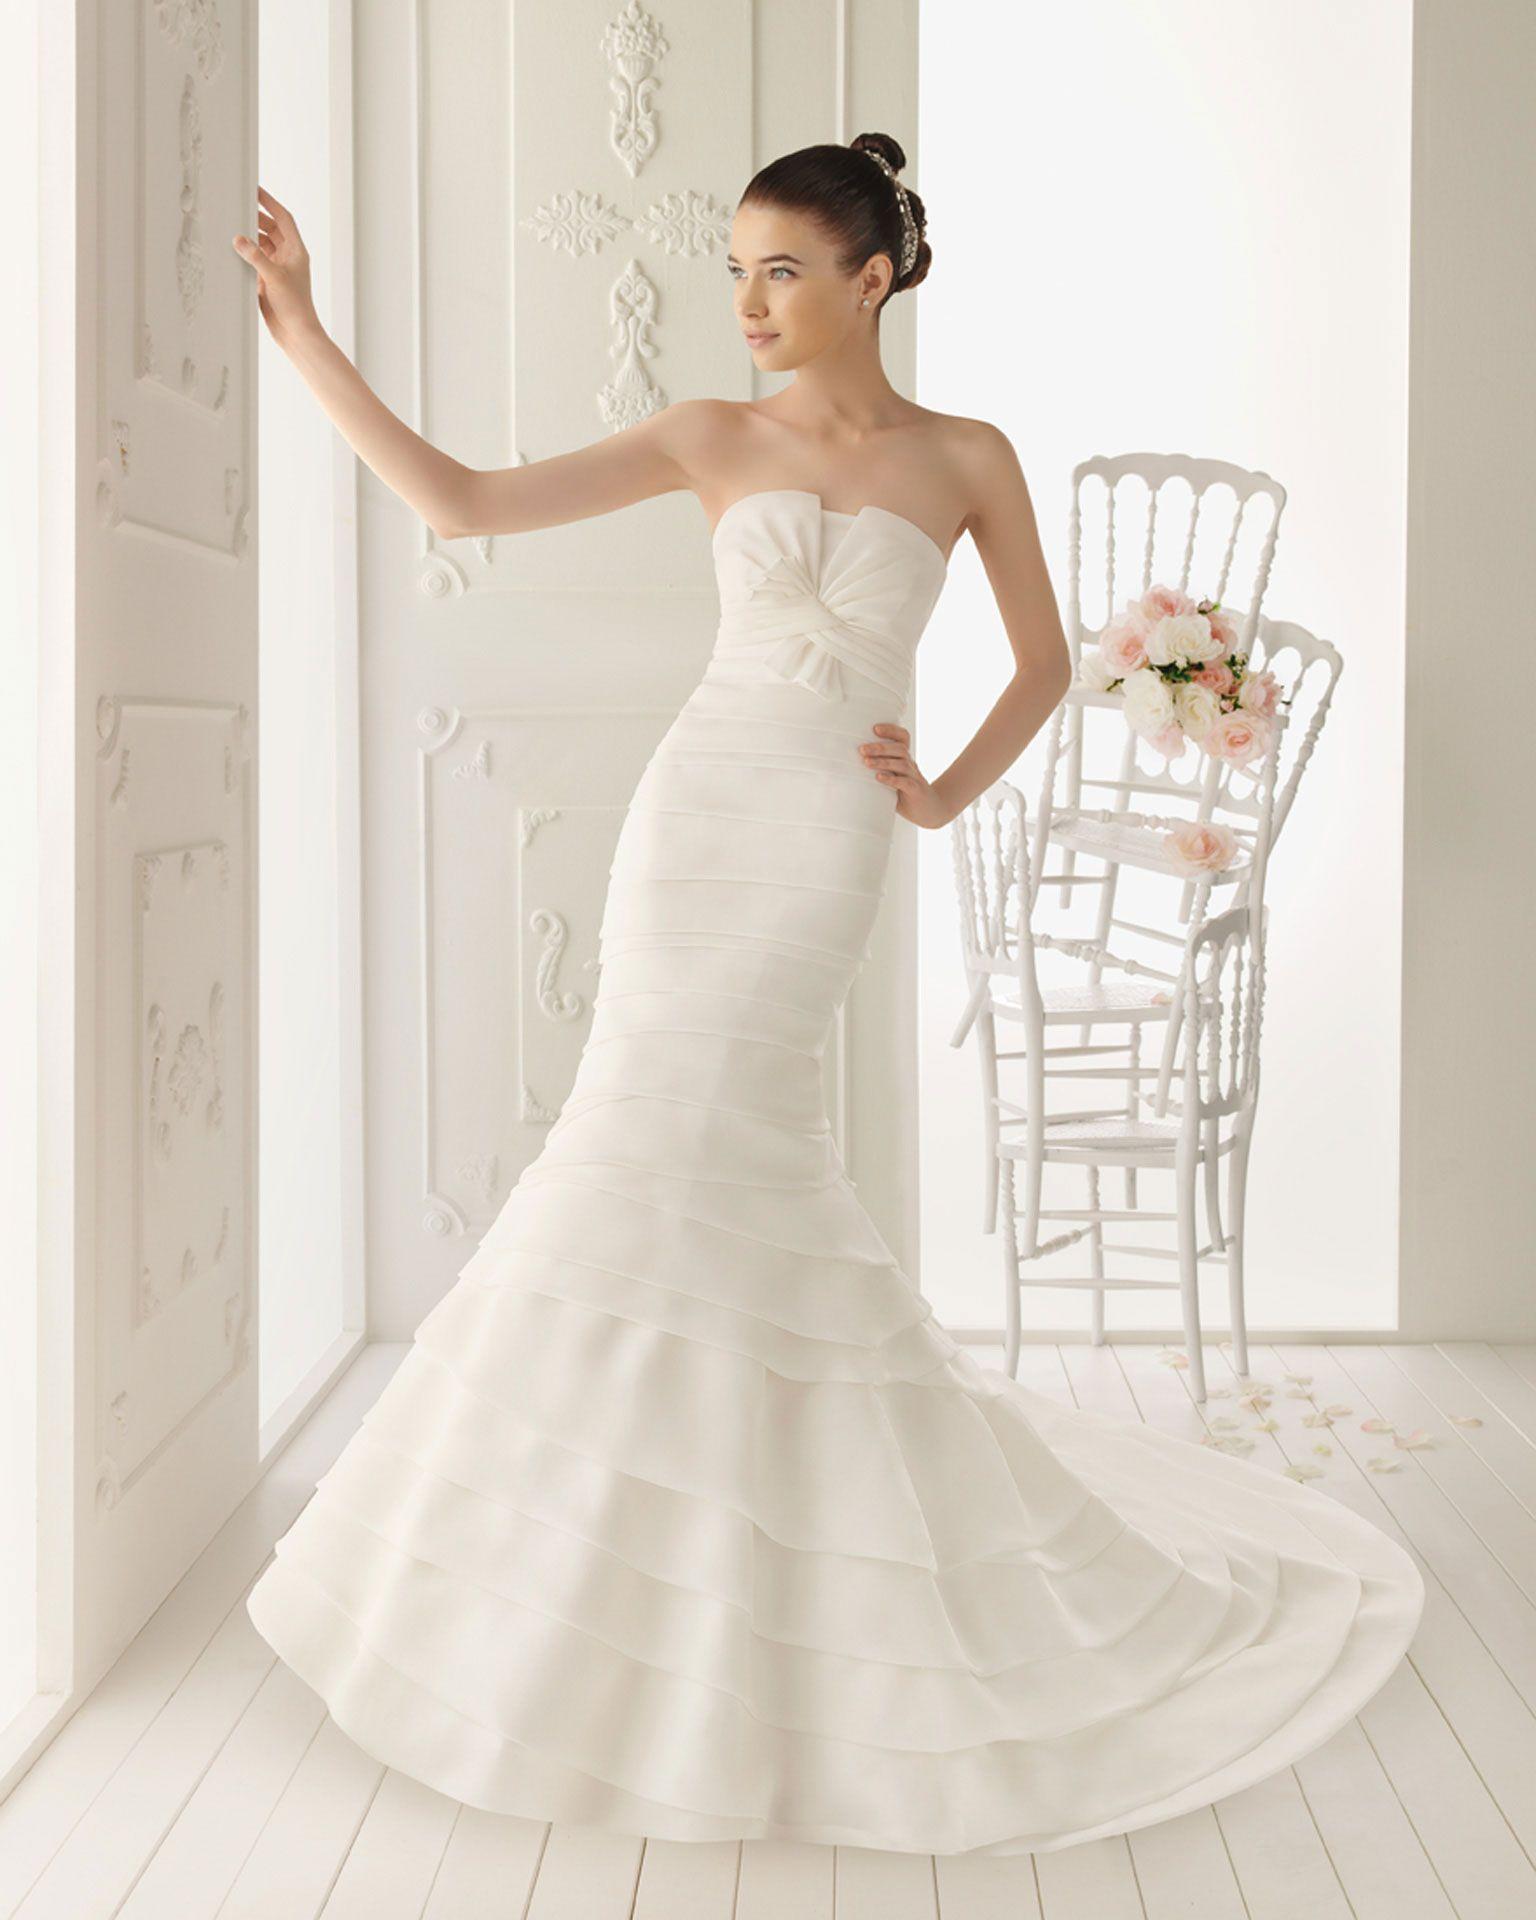 Ecru wedding dress  ROLAN  Organza dress in ecru  Tulle and rebrodé lace jacket